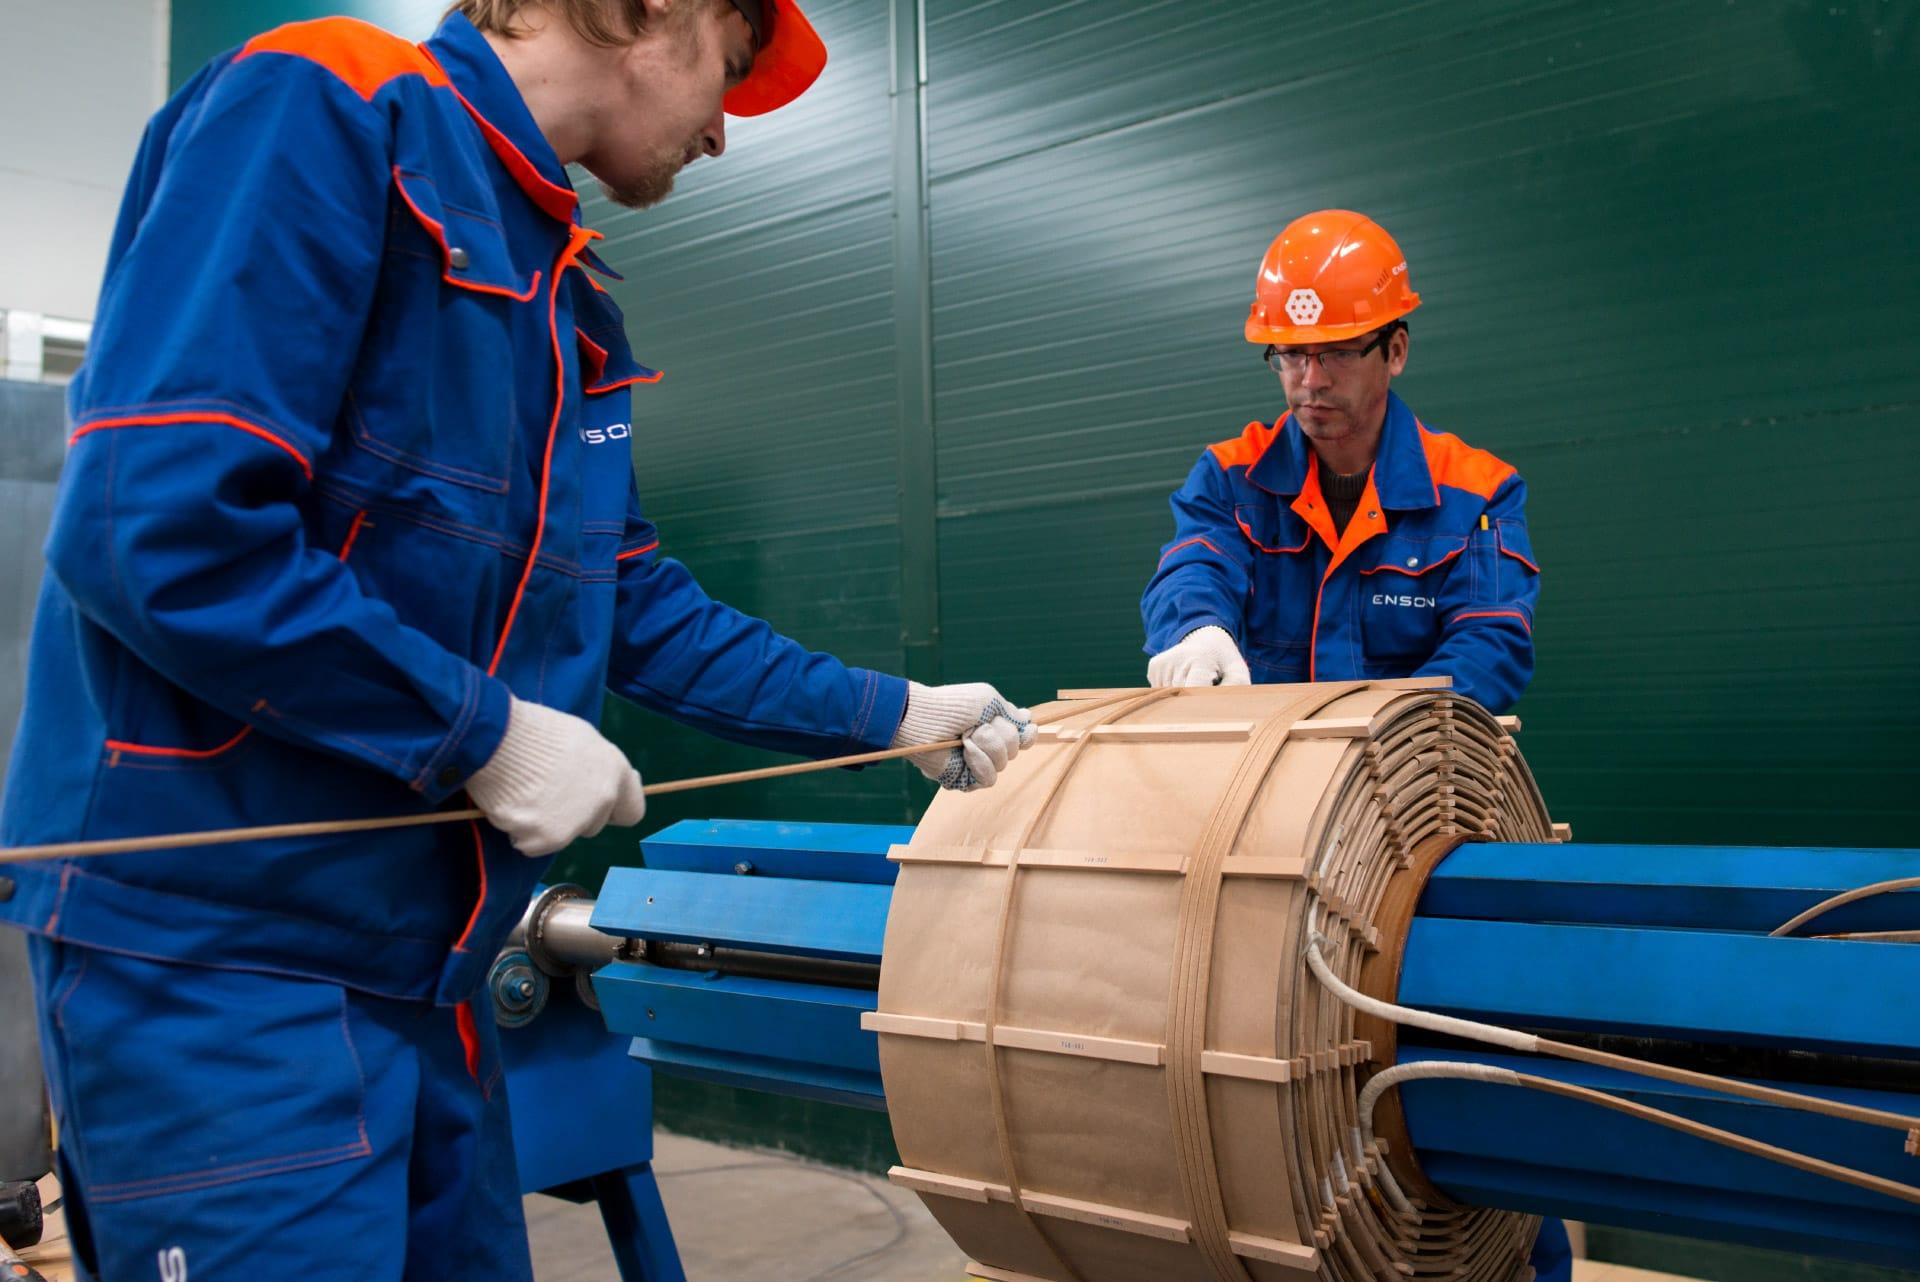 Ensons - Намотка обмоток дугогасящего реактора